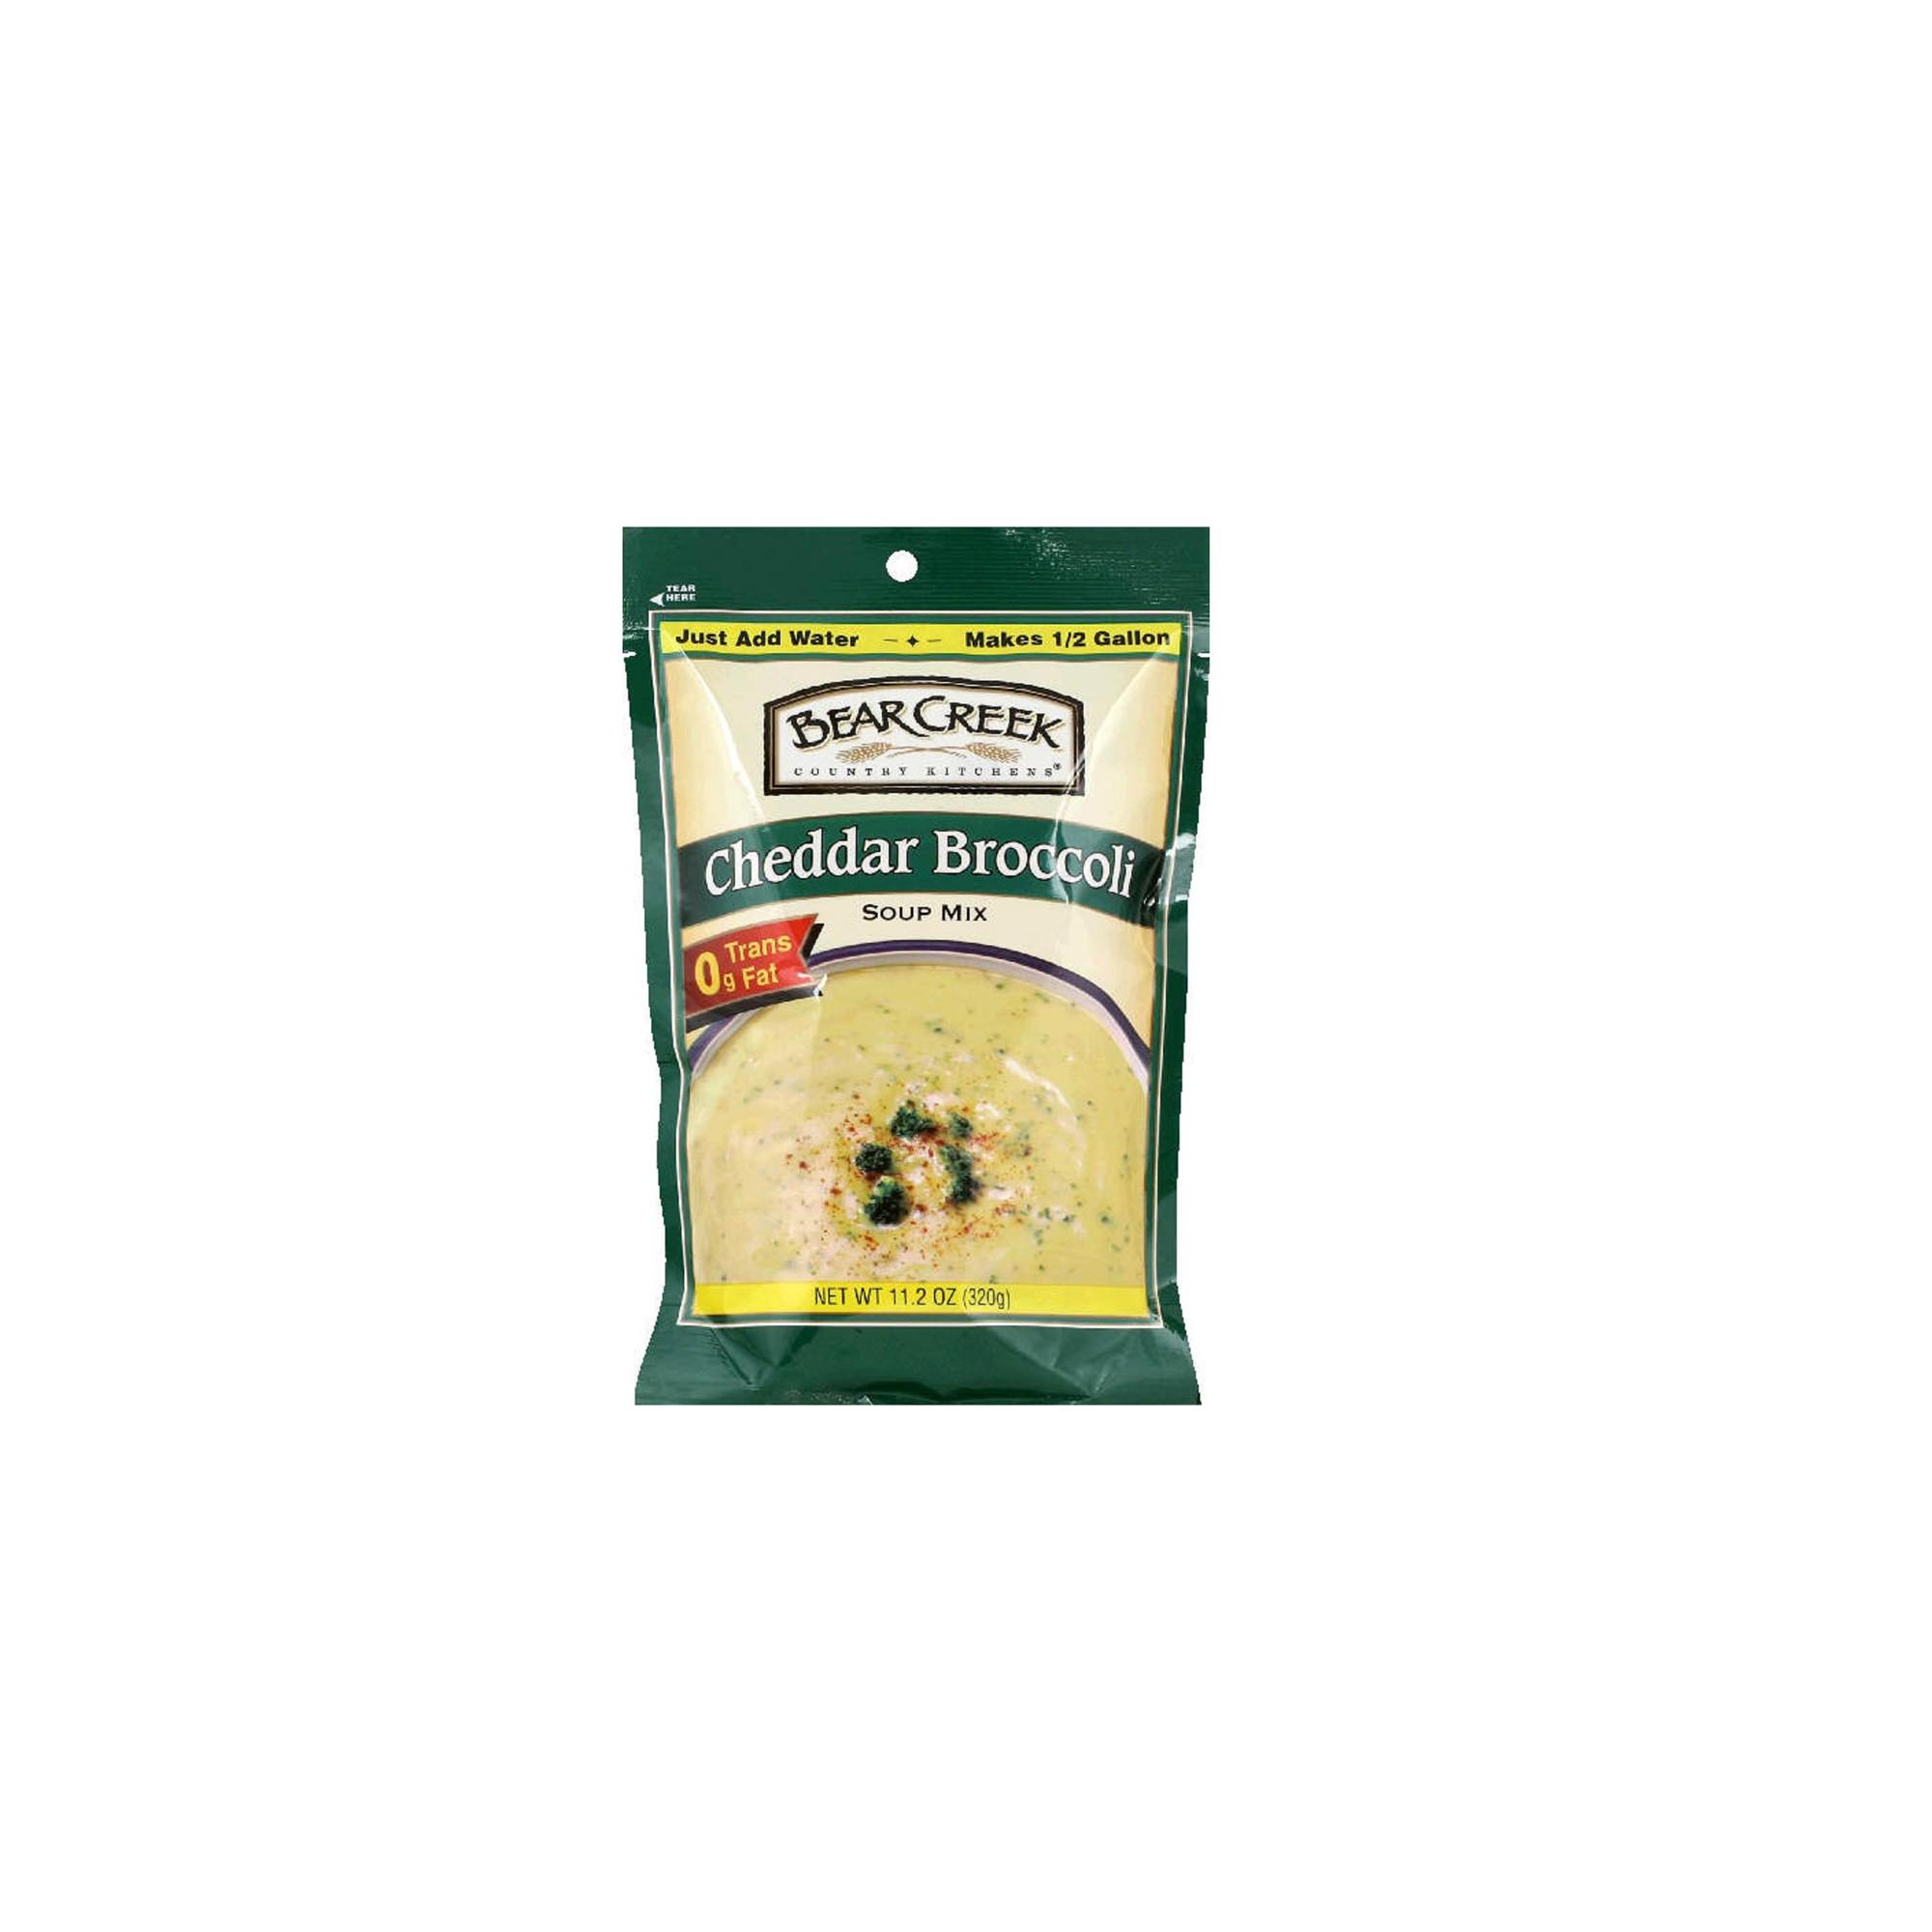 Bear Creek Country Kitchens Cheddar Broccoli Soup Mix 11.2